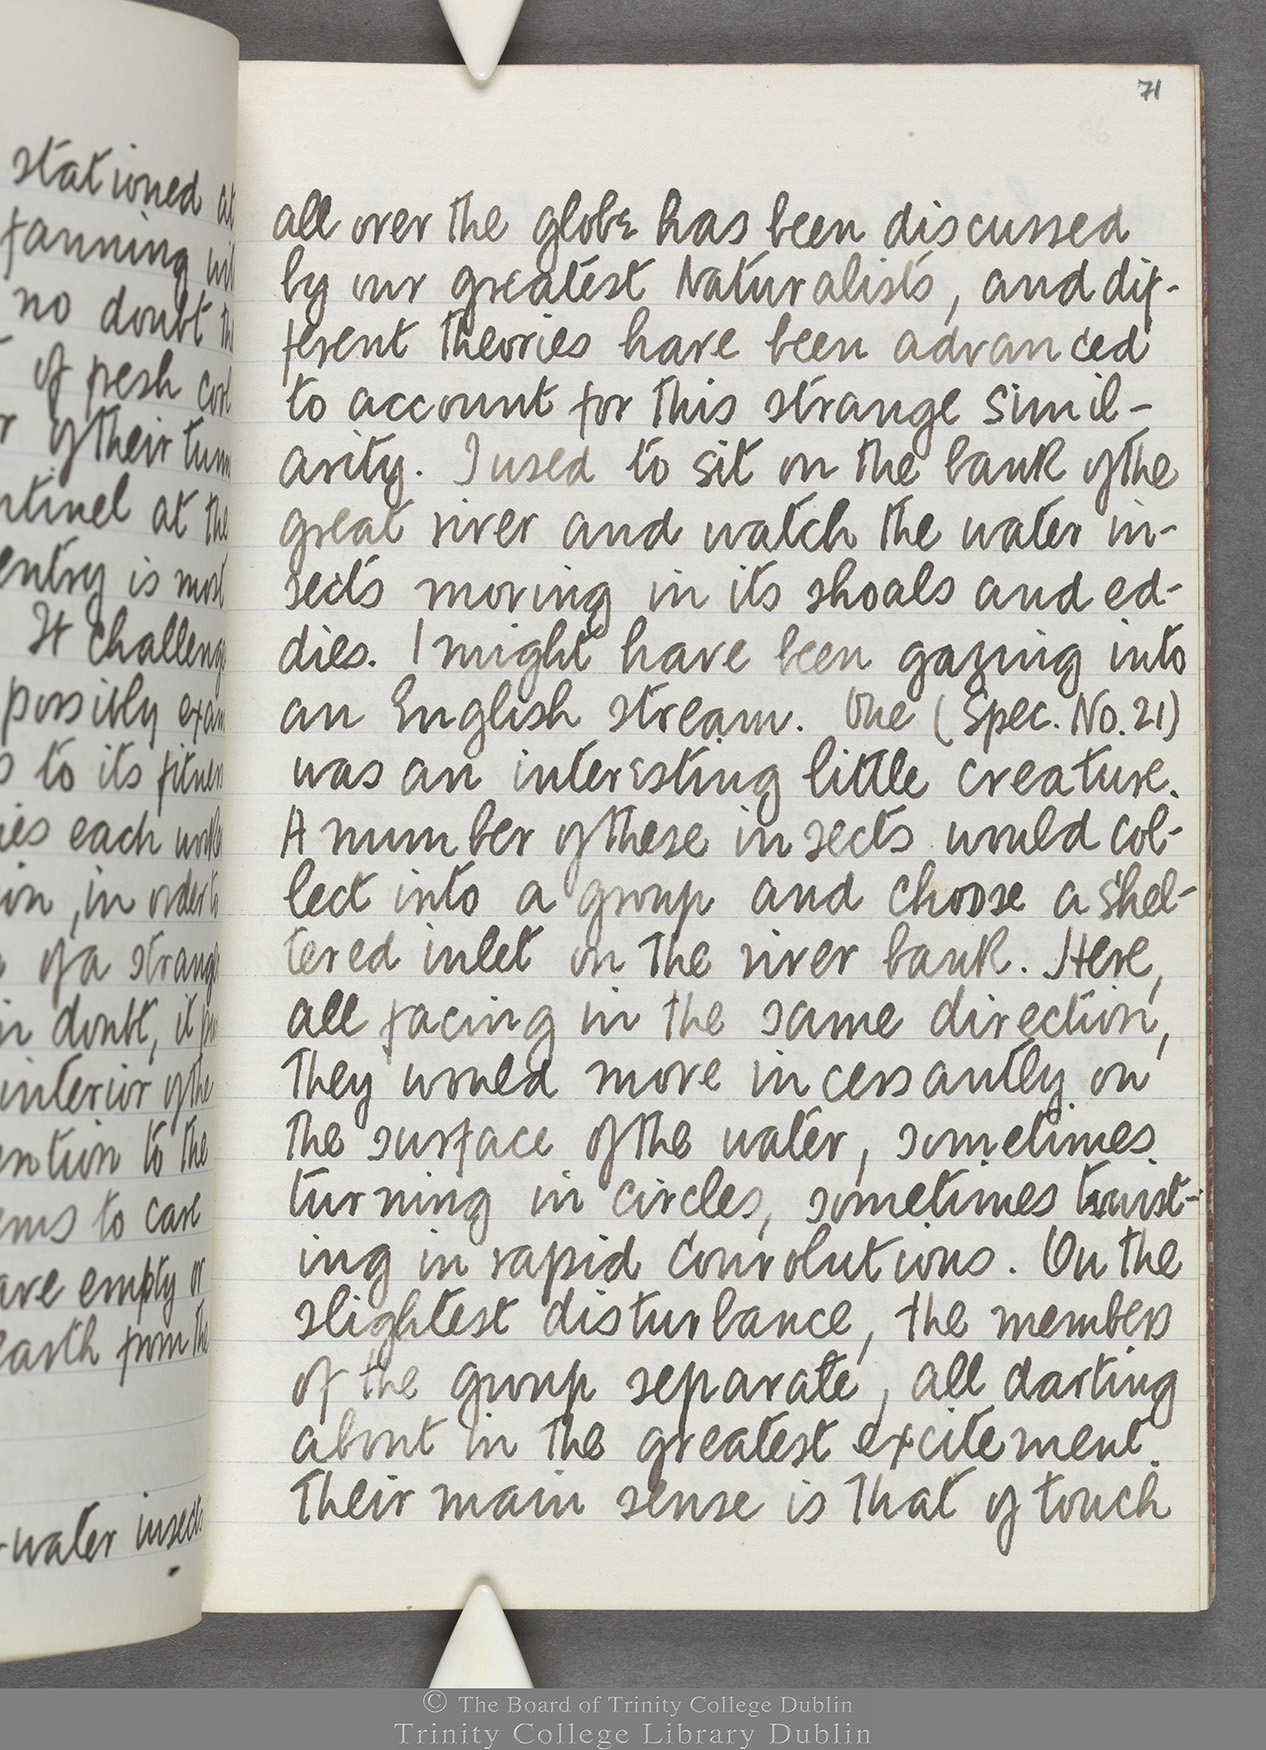 TCD MS 10516 folio 71 recto